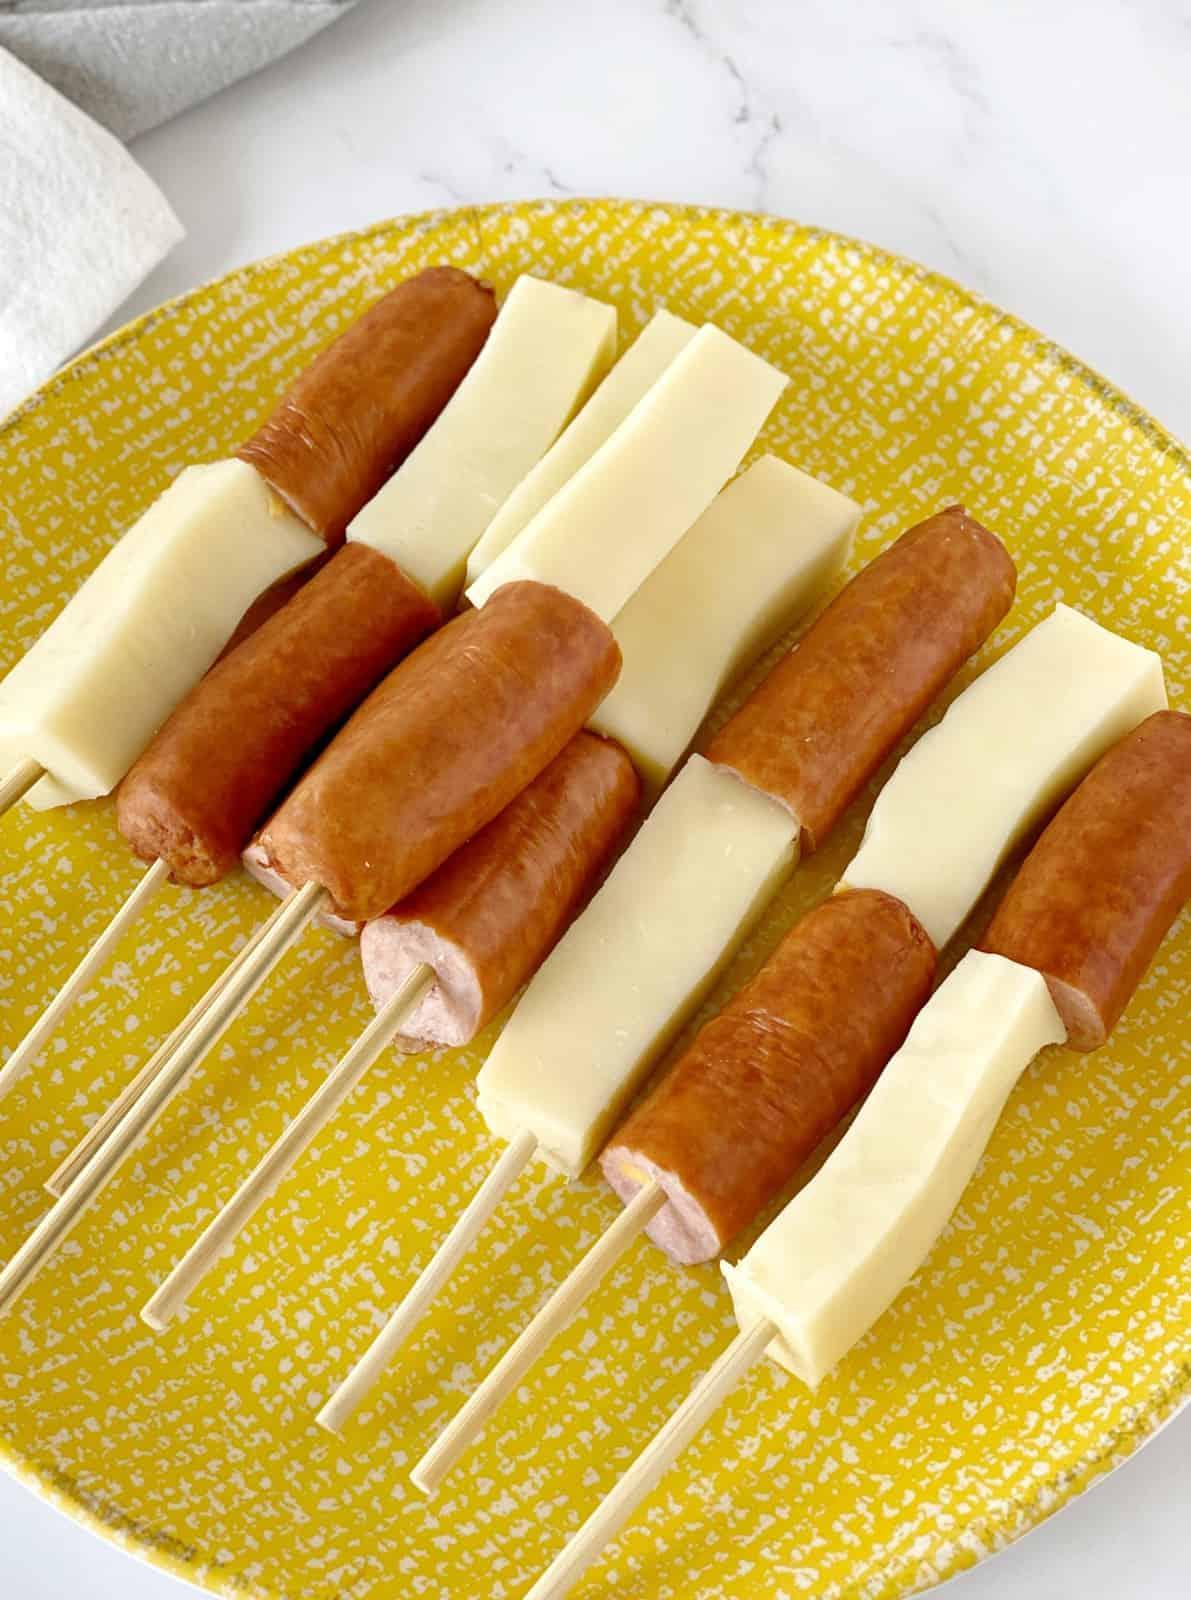 hot dog with mozzarella cheese stick on a stick